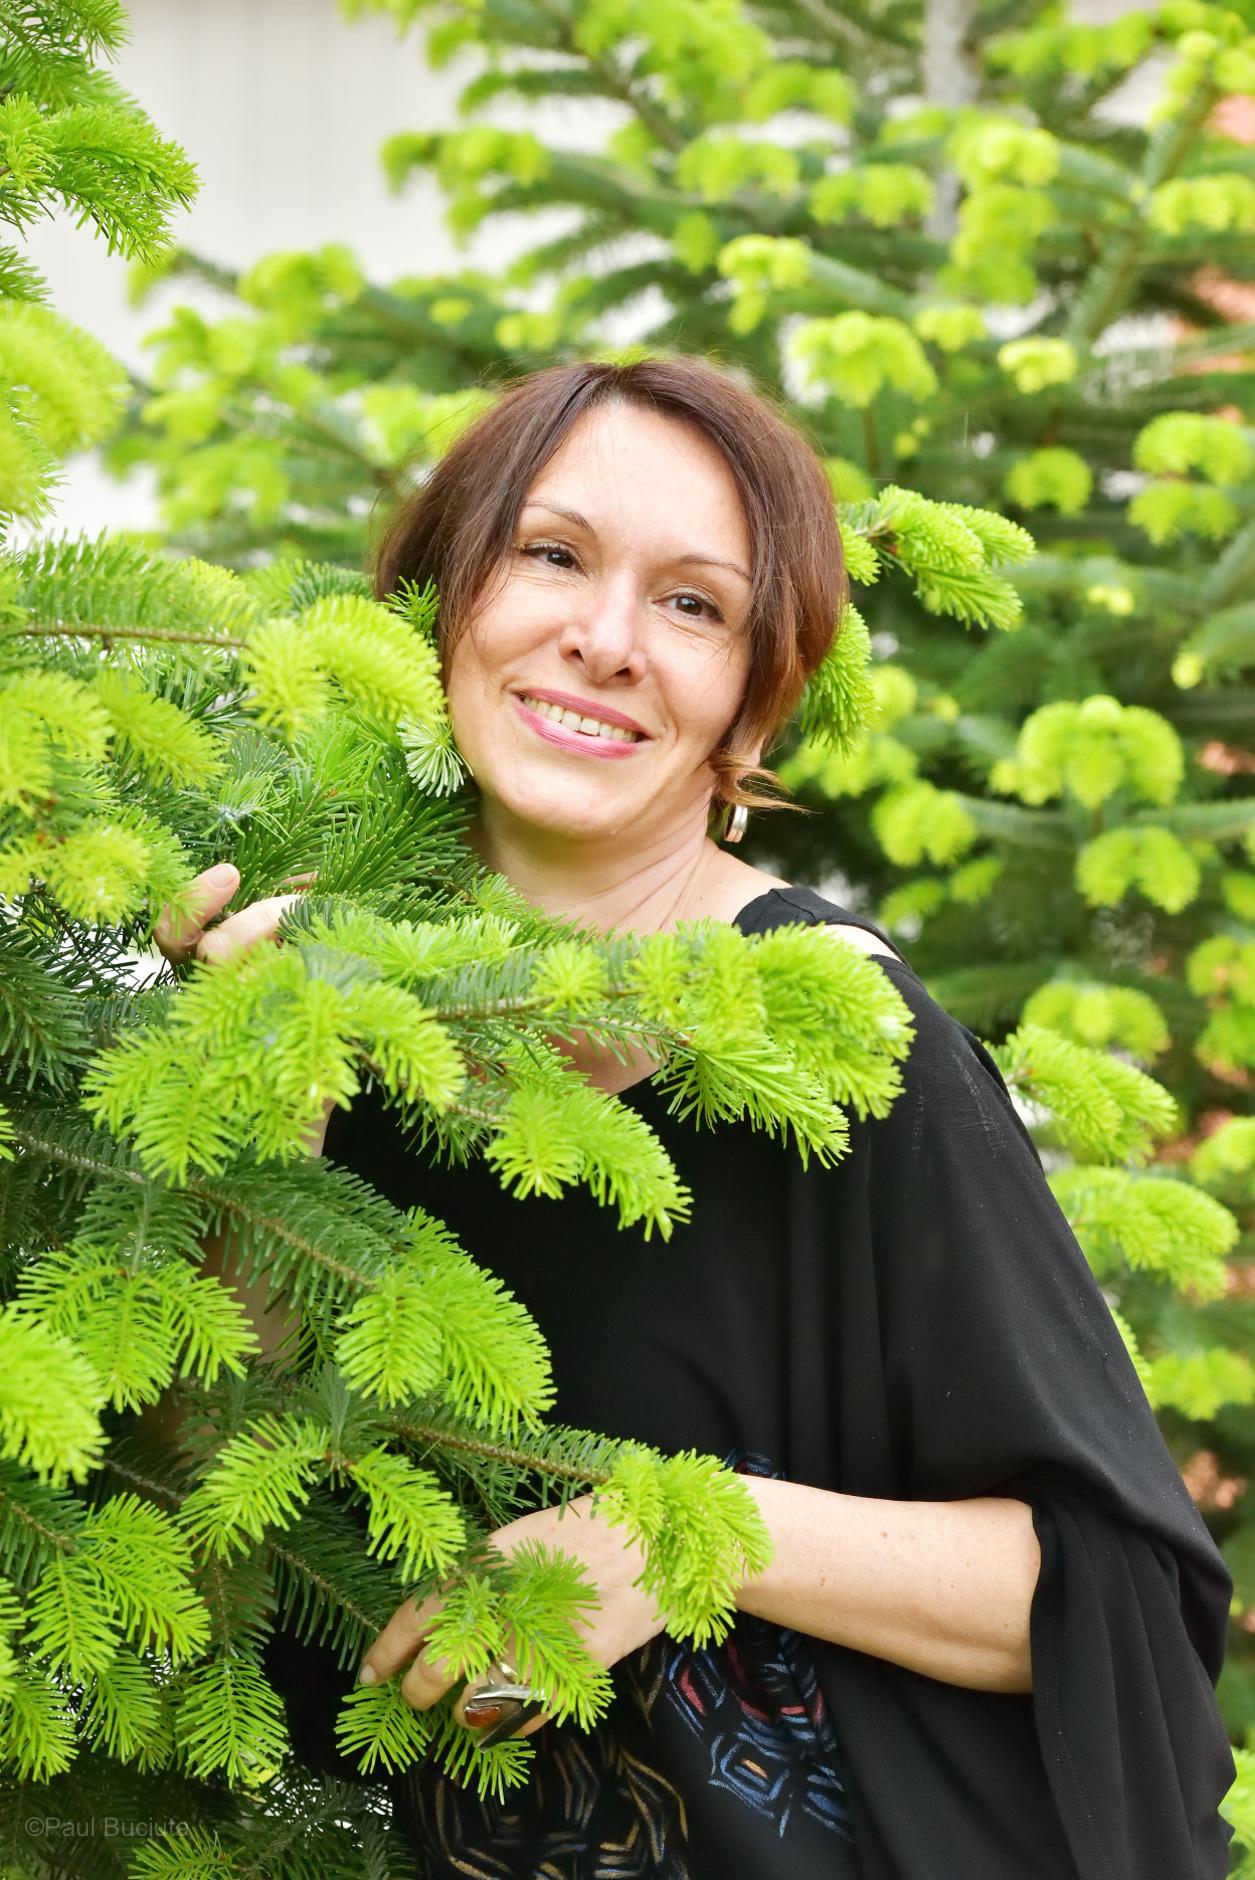 Maria Manzat, interviu pentru Marea Dragoste-revistatango.ro, nr. 140, iunie 2018